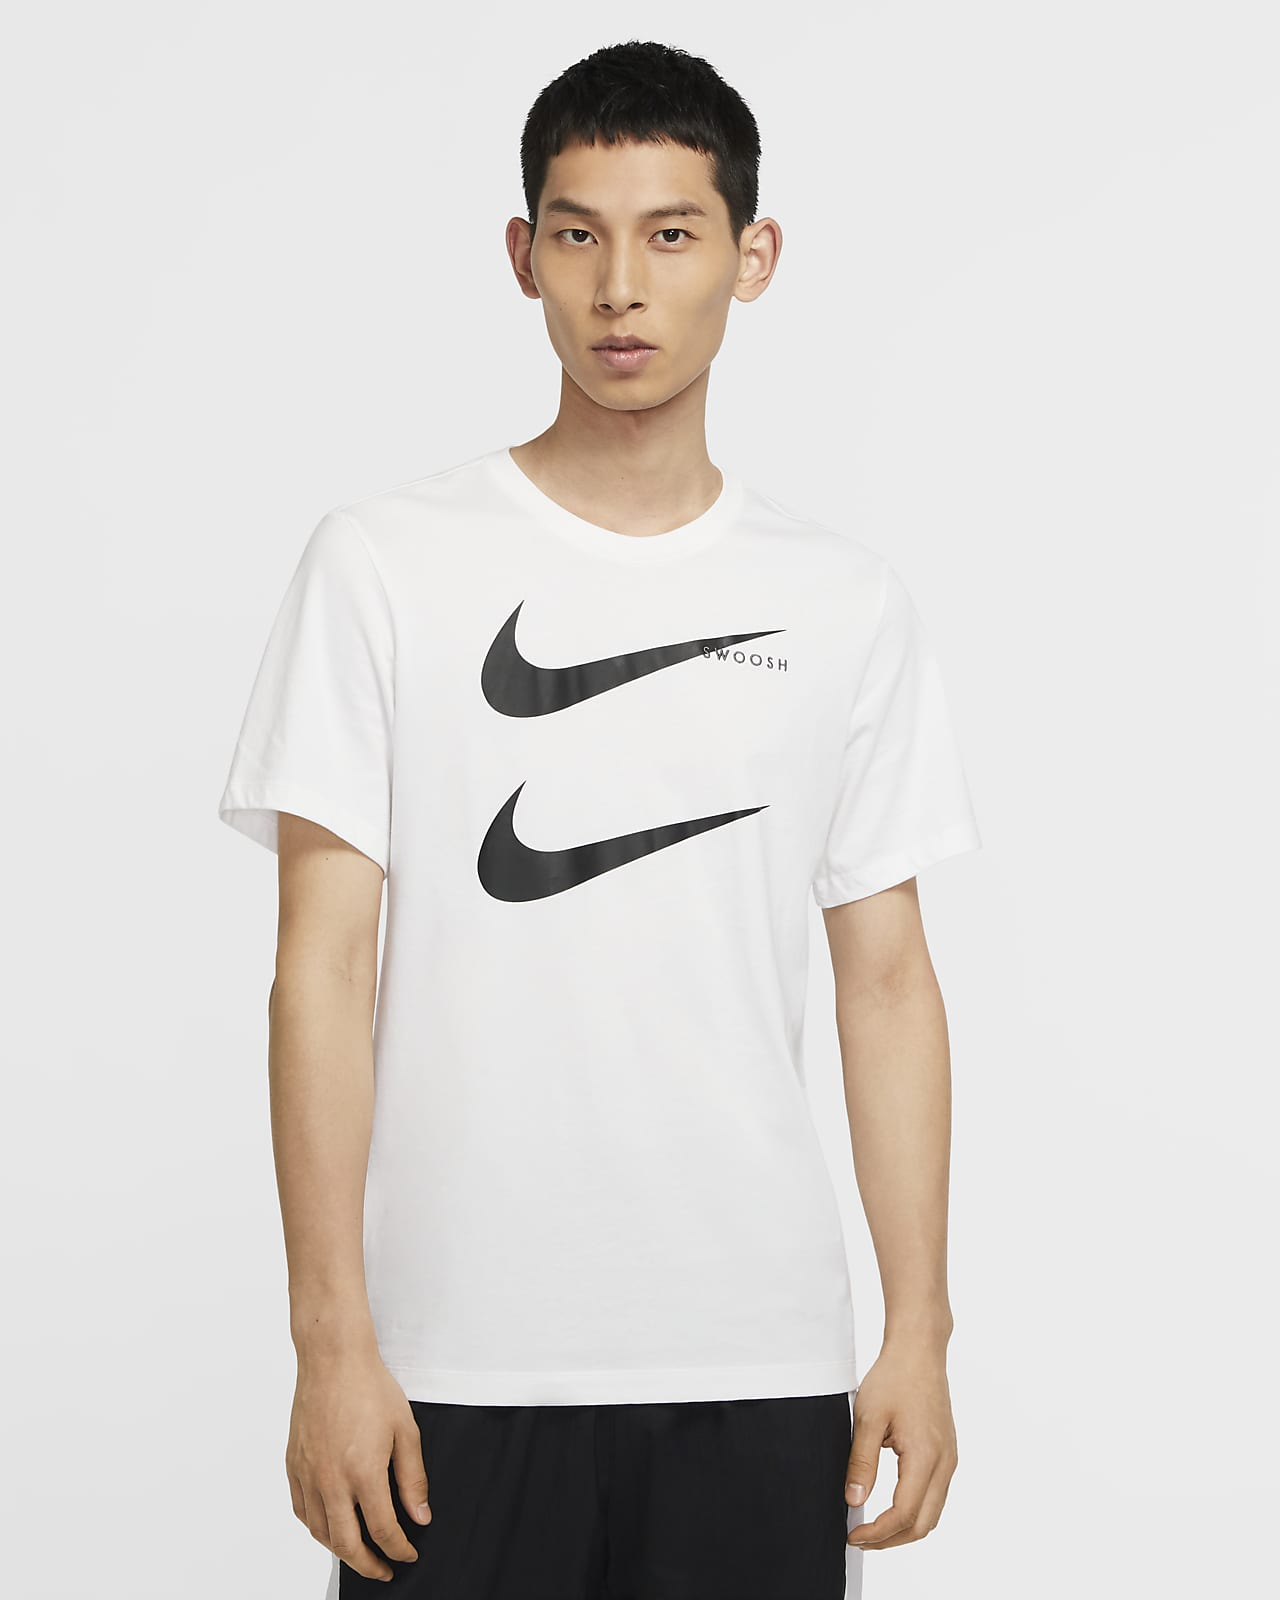 Registrarse Opcional Injusto  Nike Sportswear Swoosh Men's T-Shirt. Nike JP